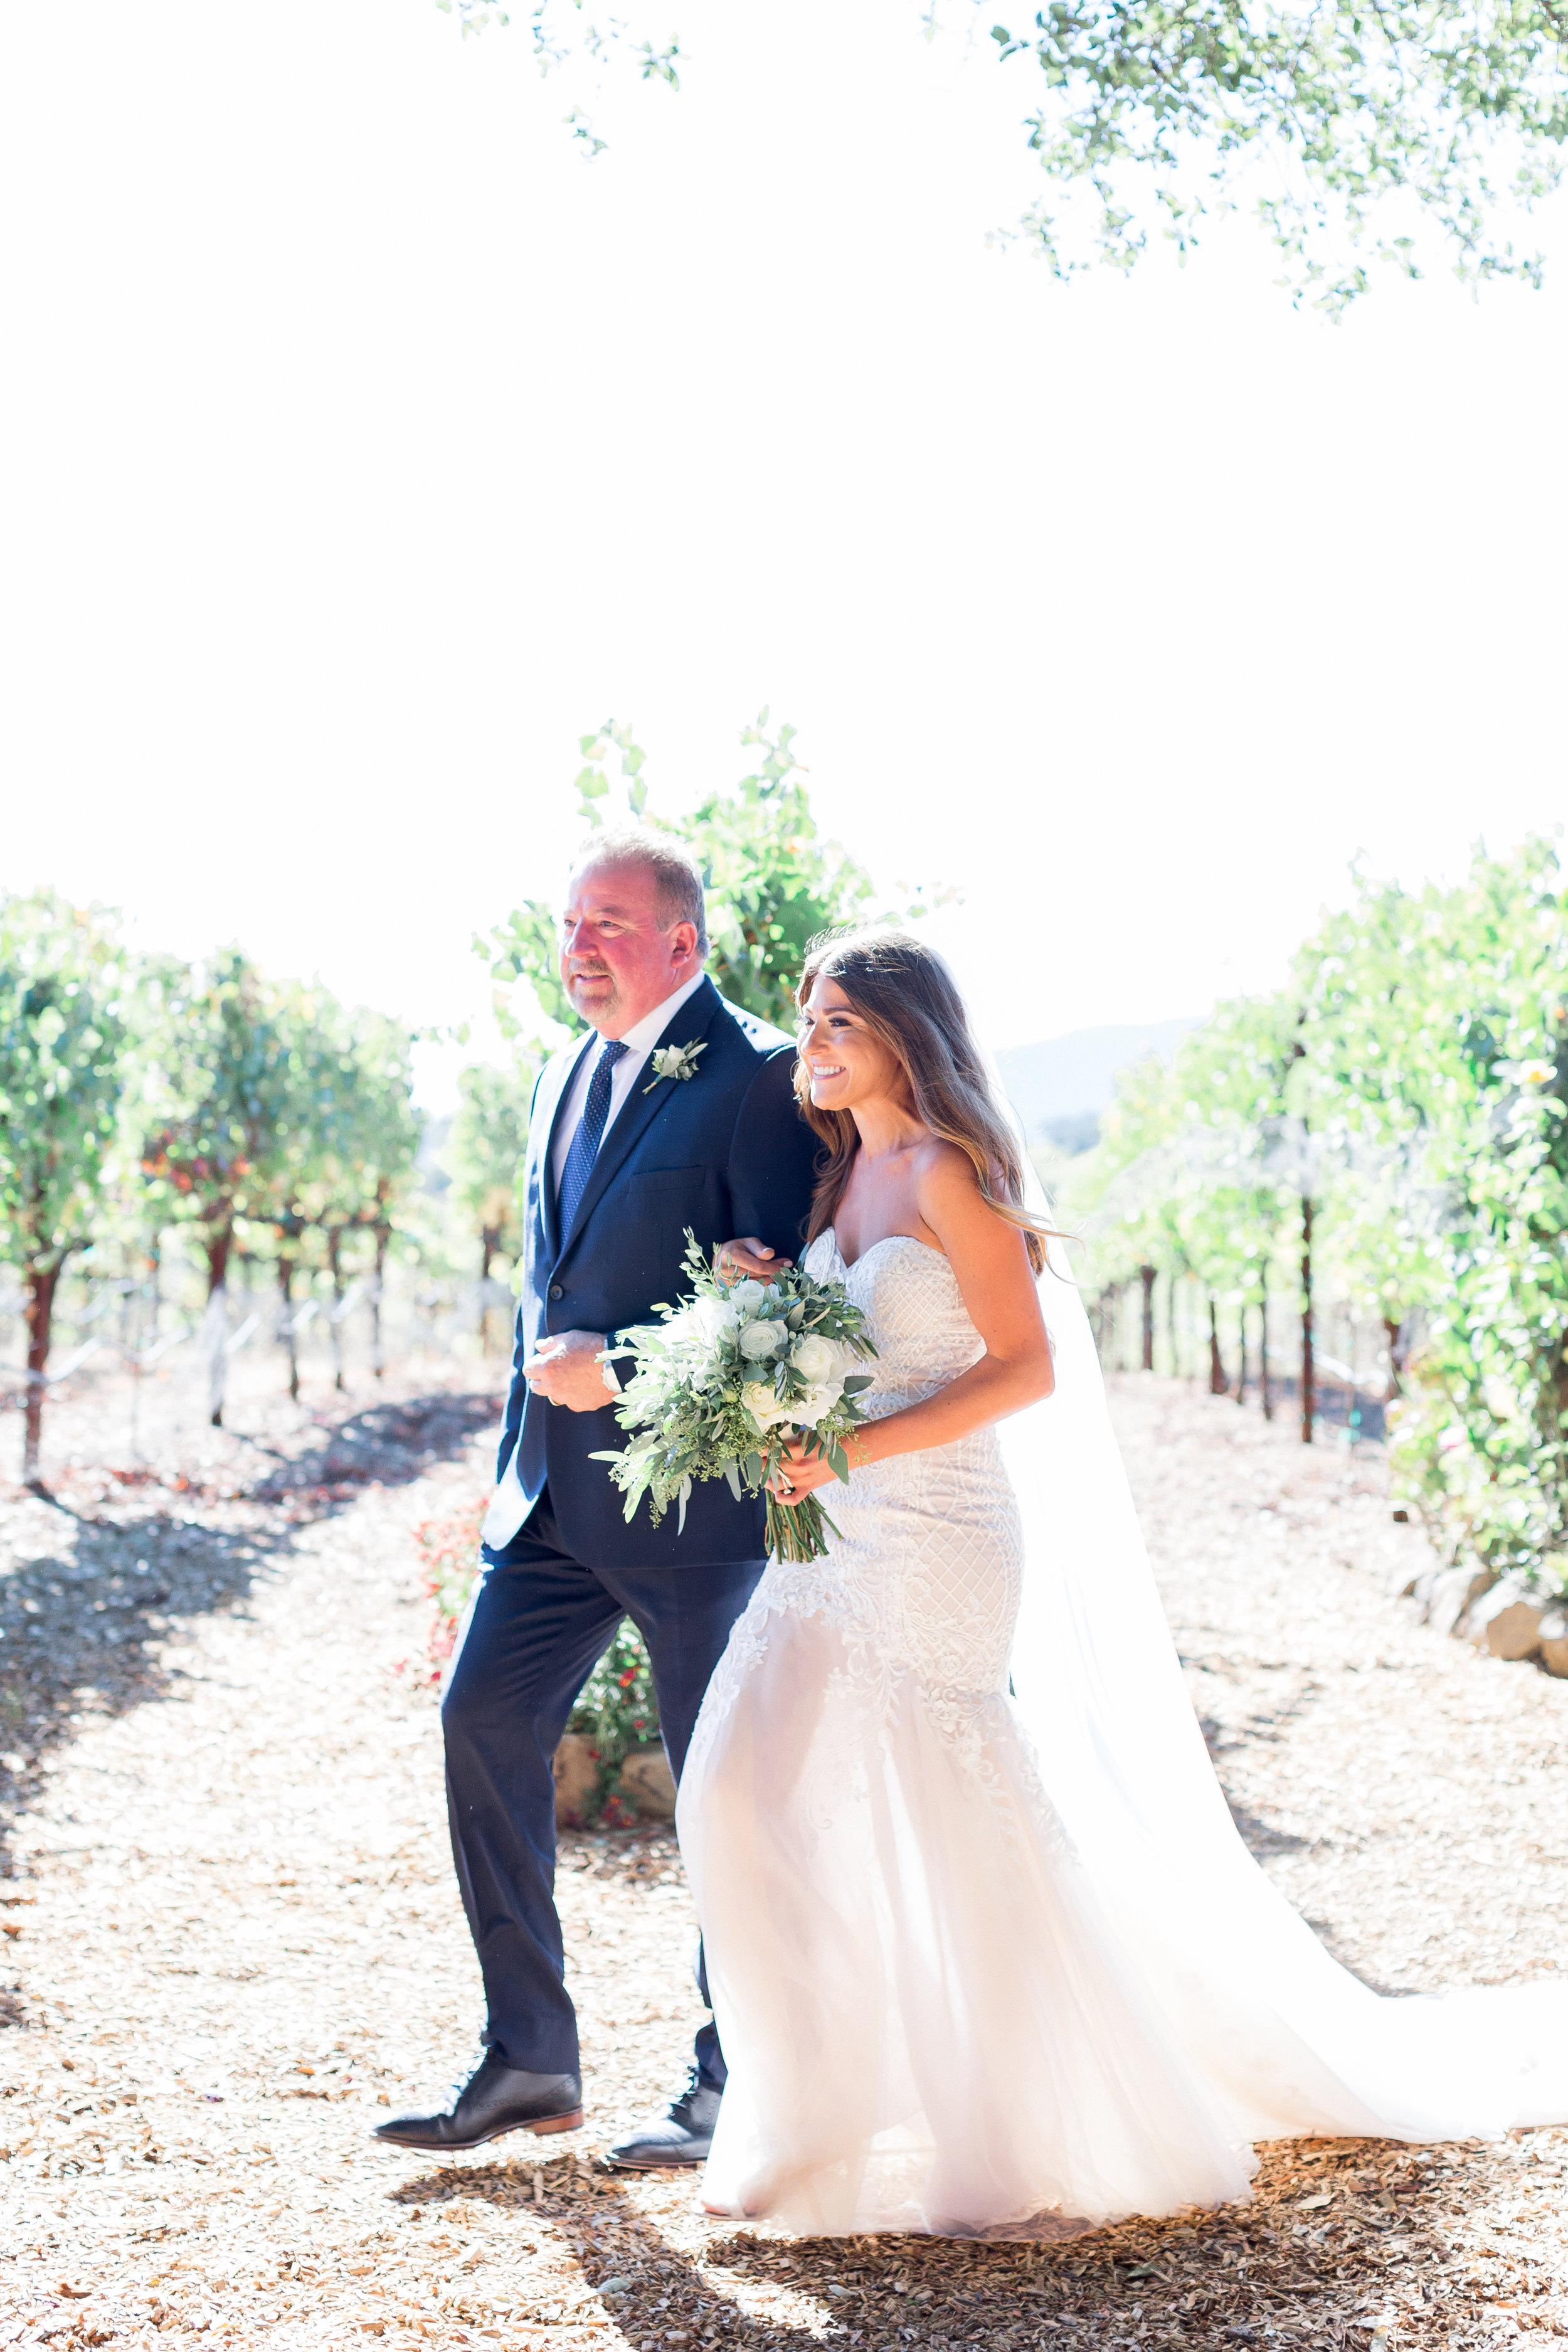 Napa-wedding-photographer-captures-destination-wedding0in-vineyards138 of 262).jpg